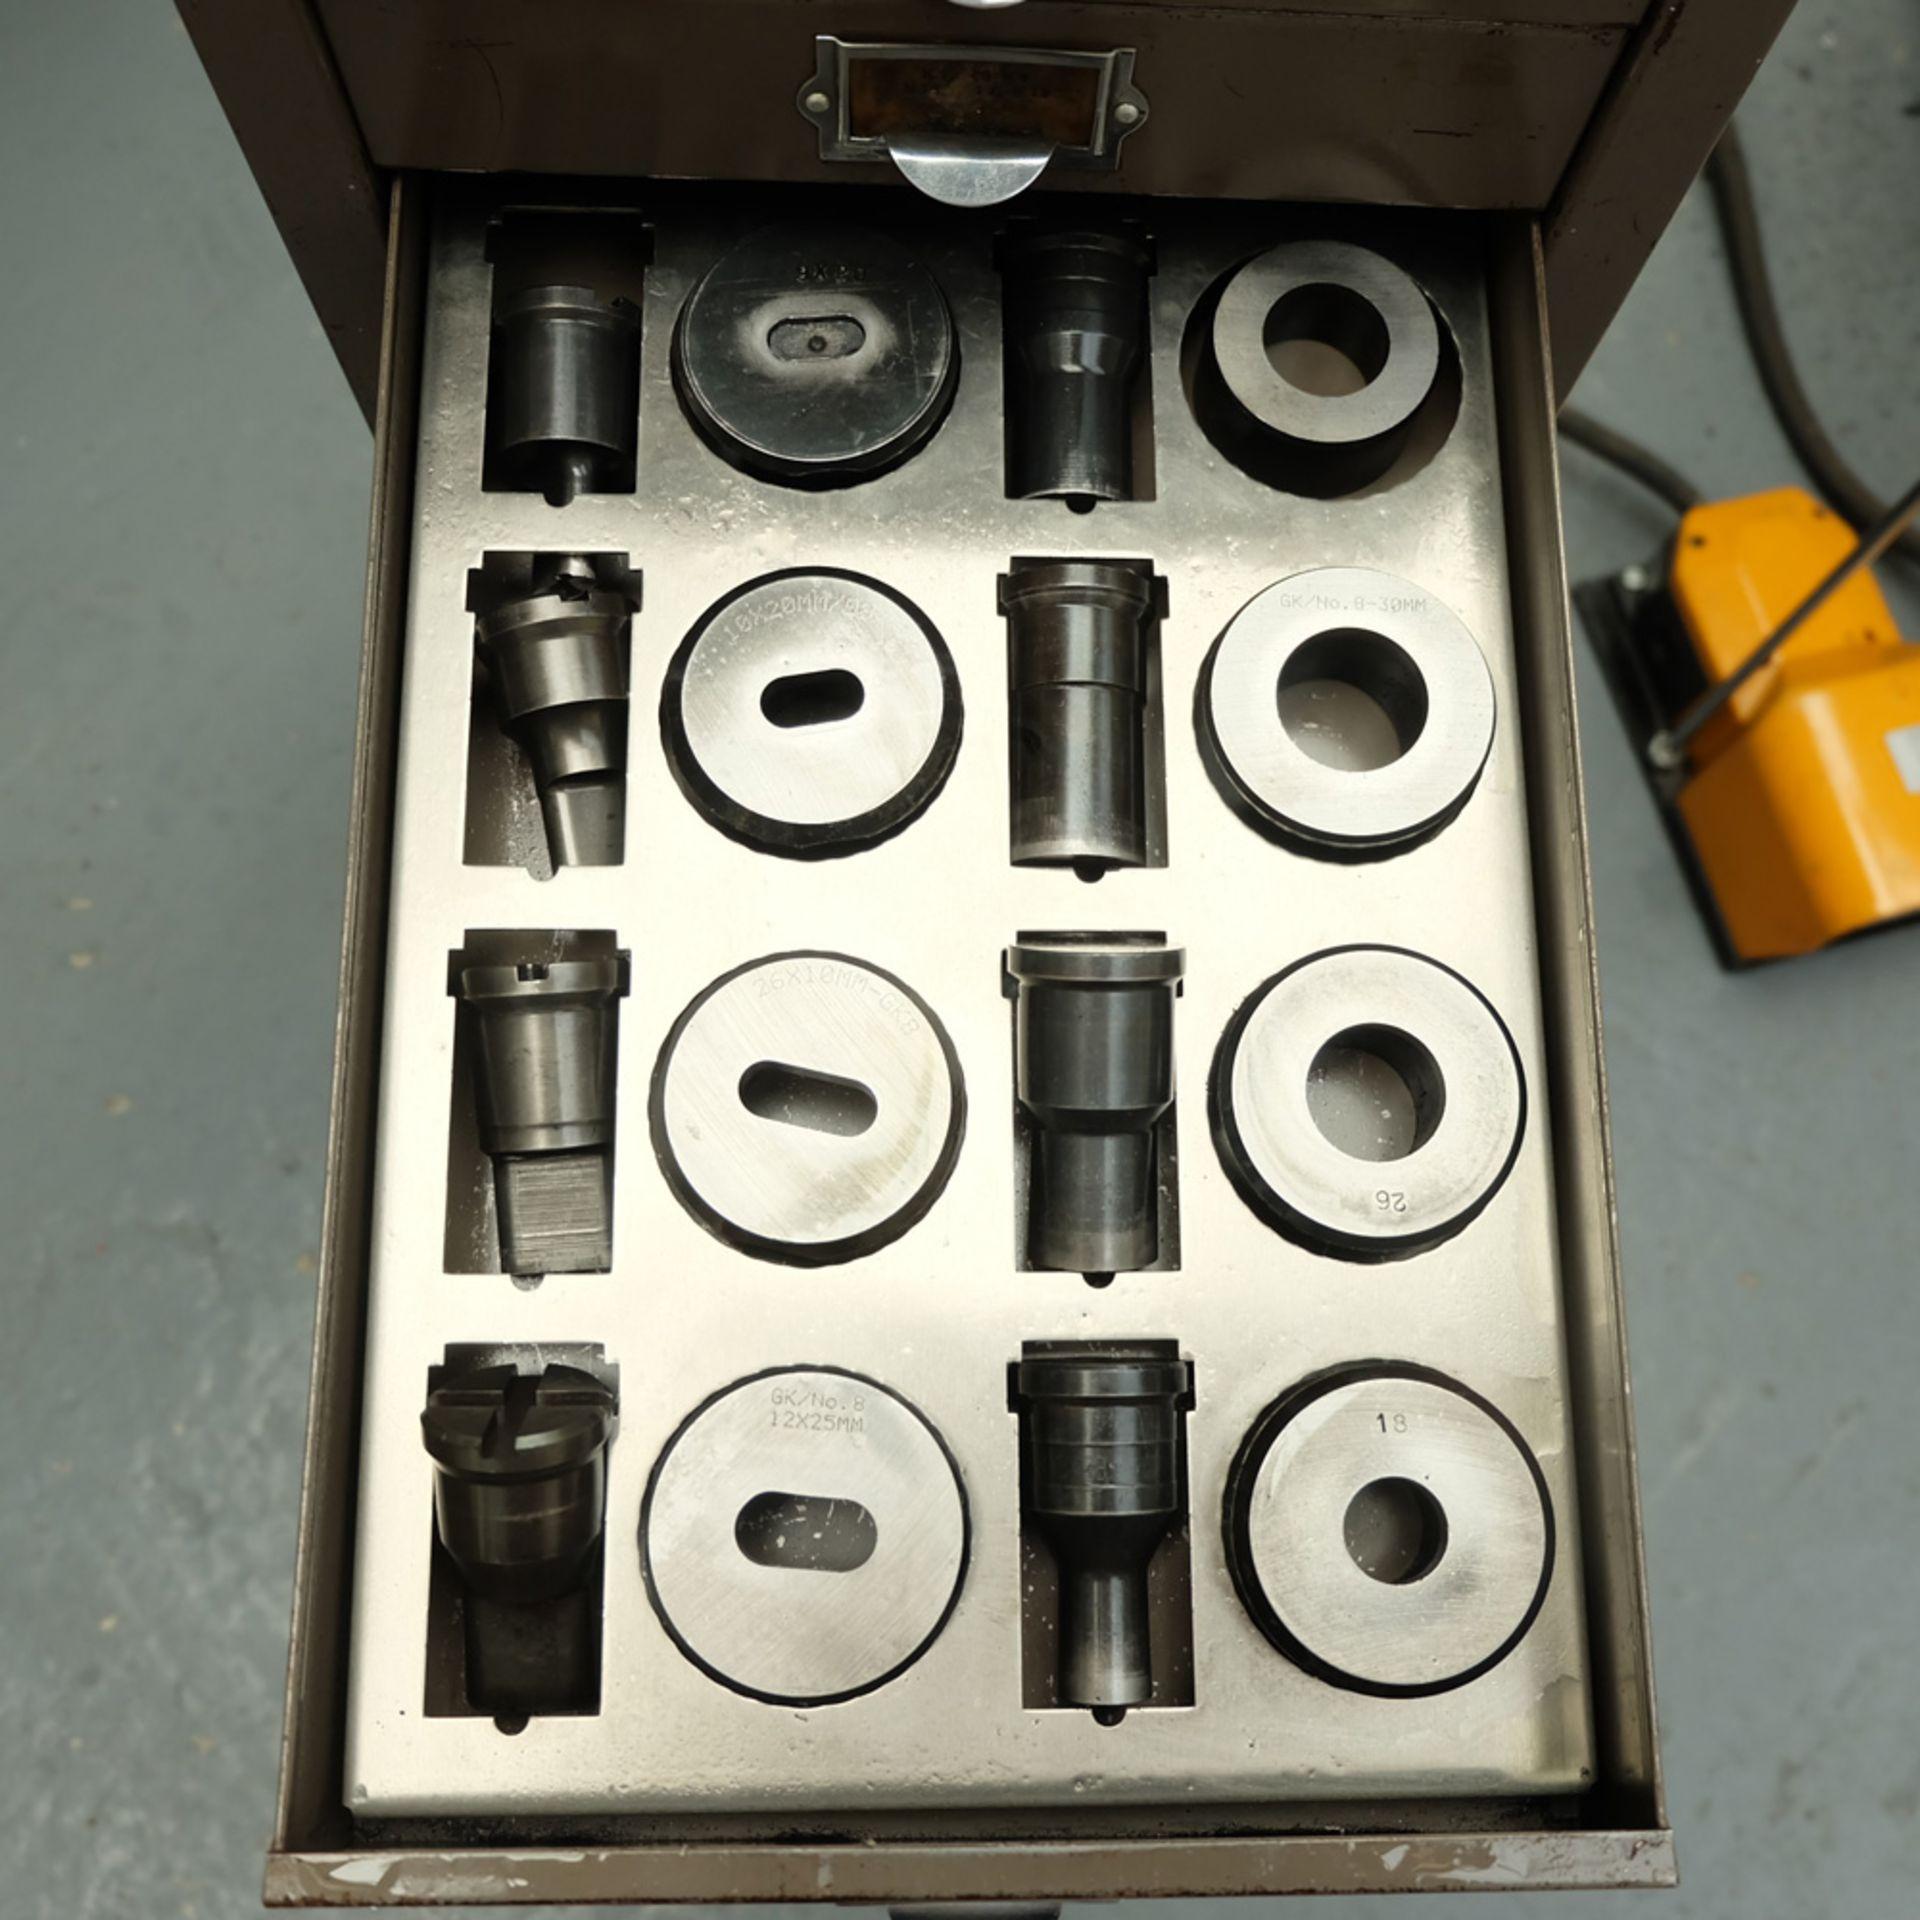 GEKA Model HYD 80/A Universal Steelworker - Image 21 of 21